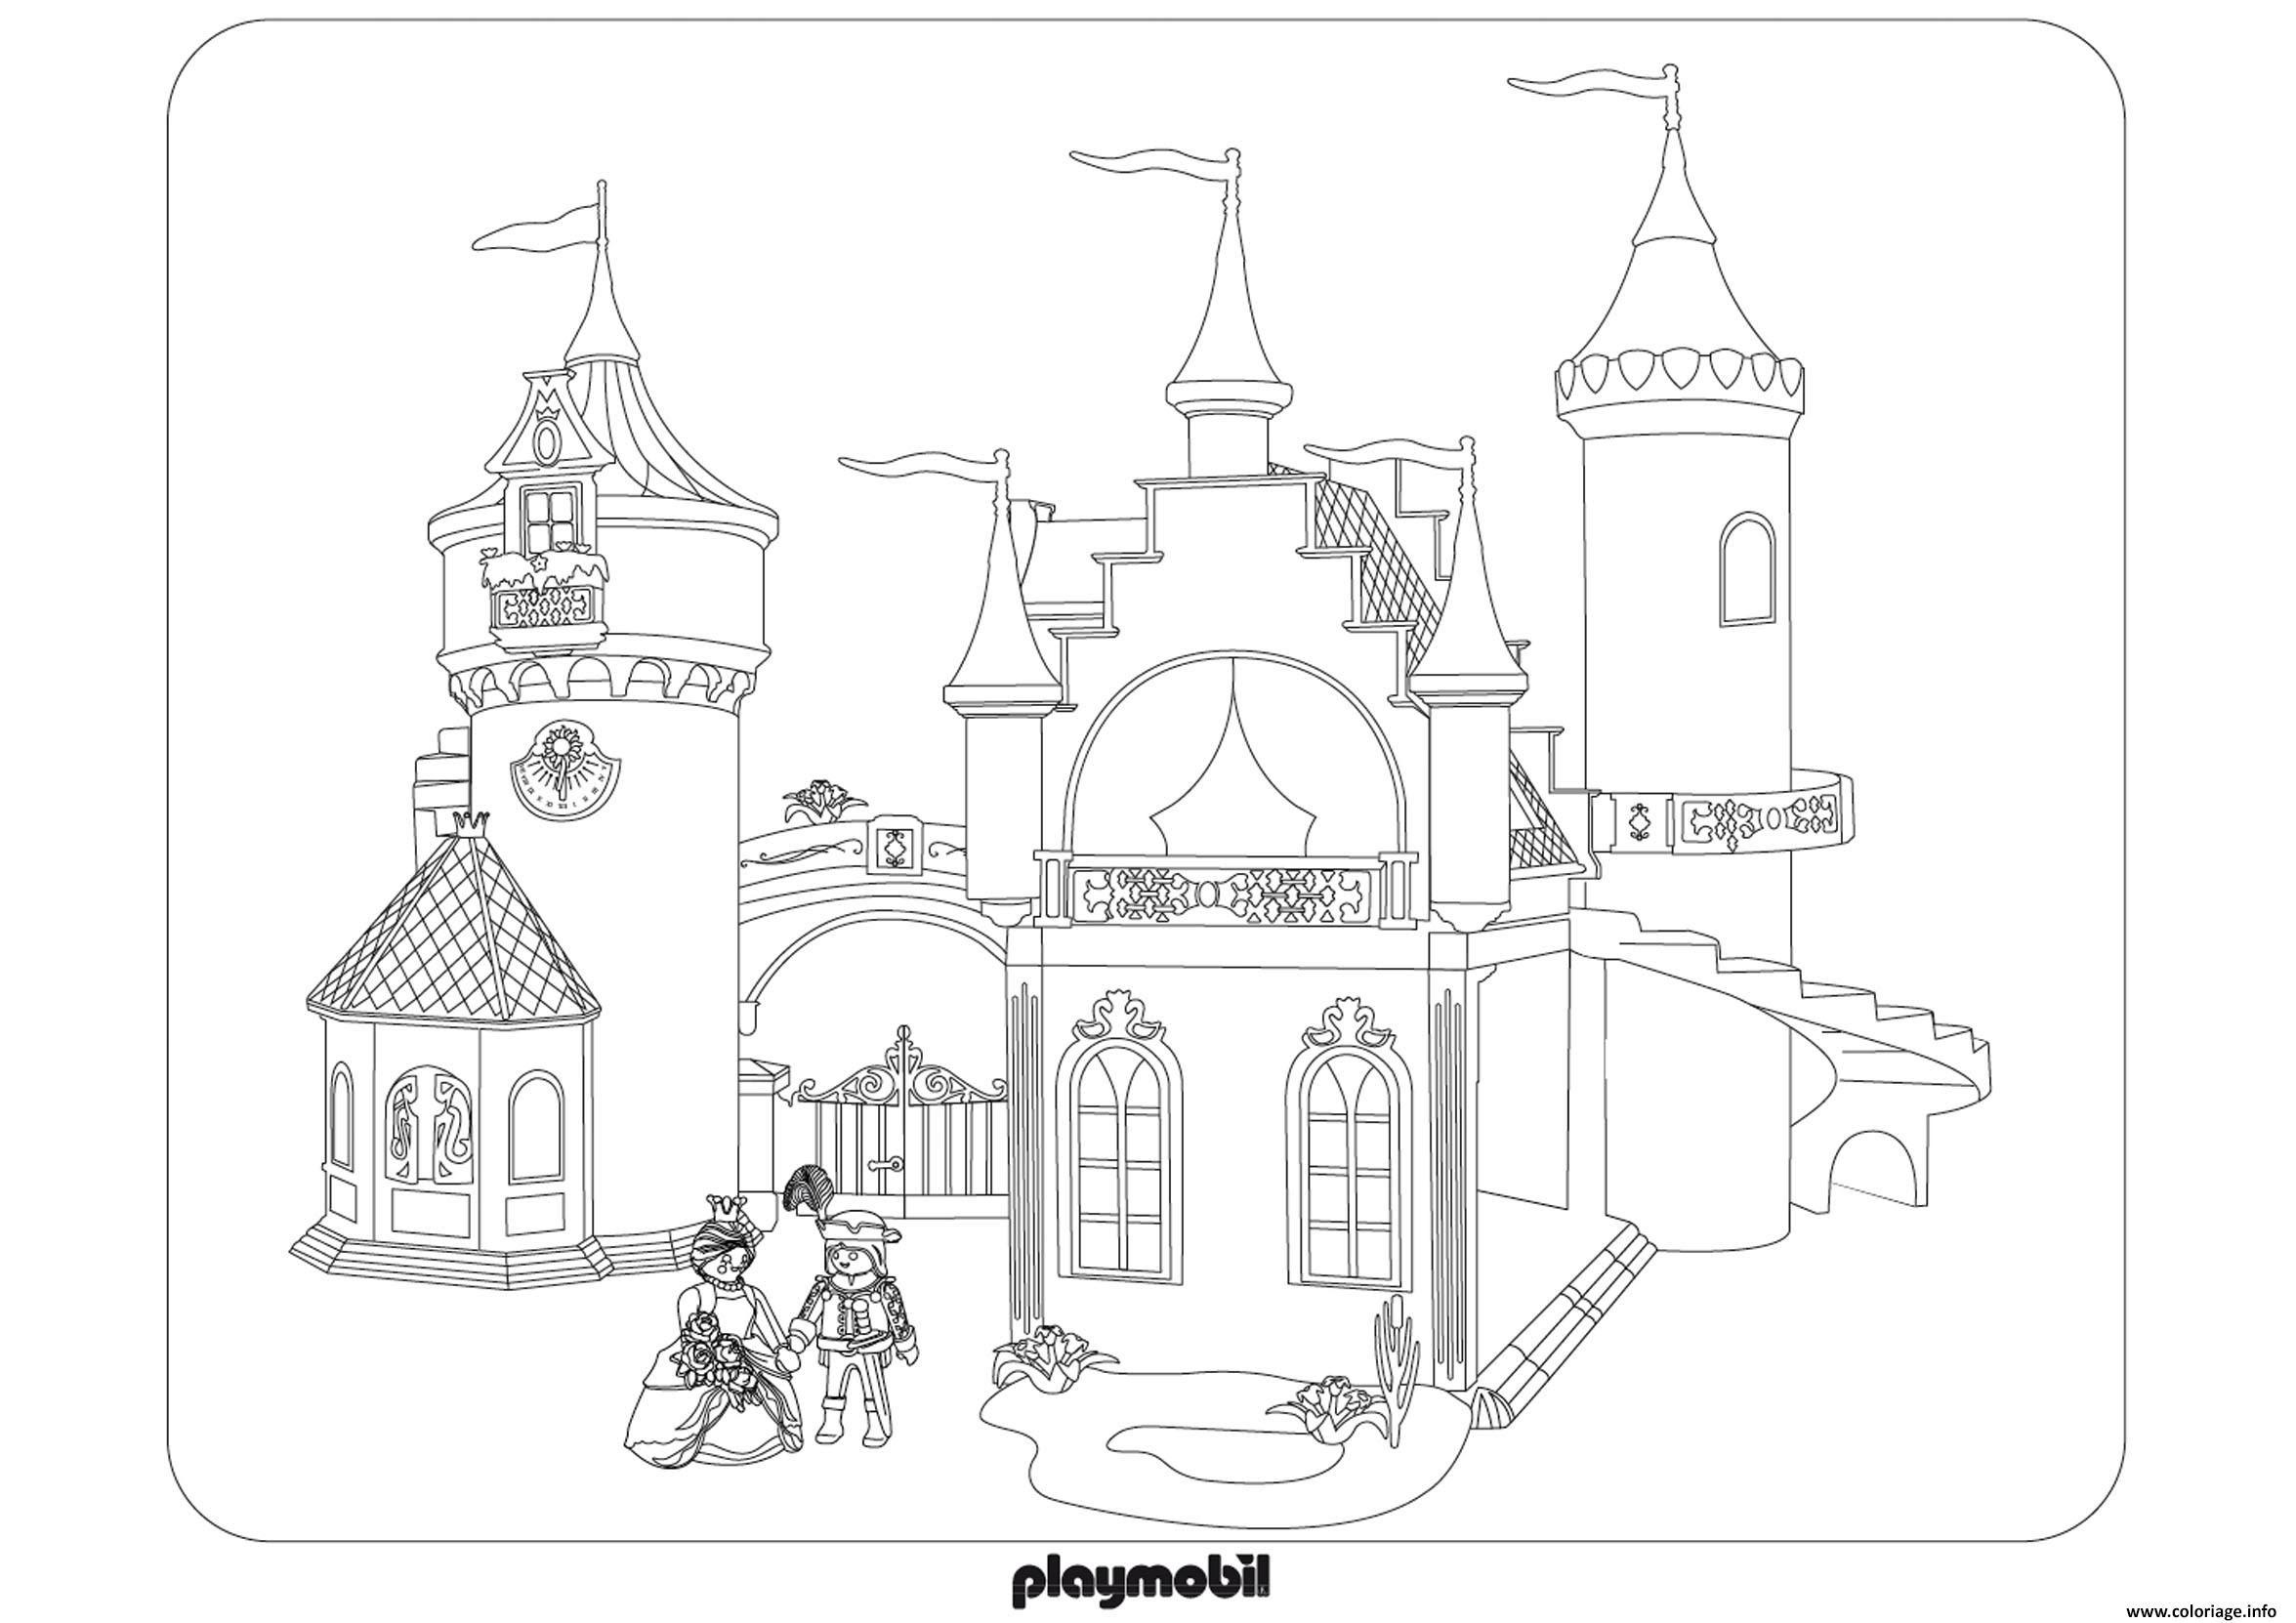 Coloriage Chateau Roi Reine Princesse Playmobil Dessin  Imprimer